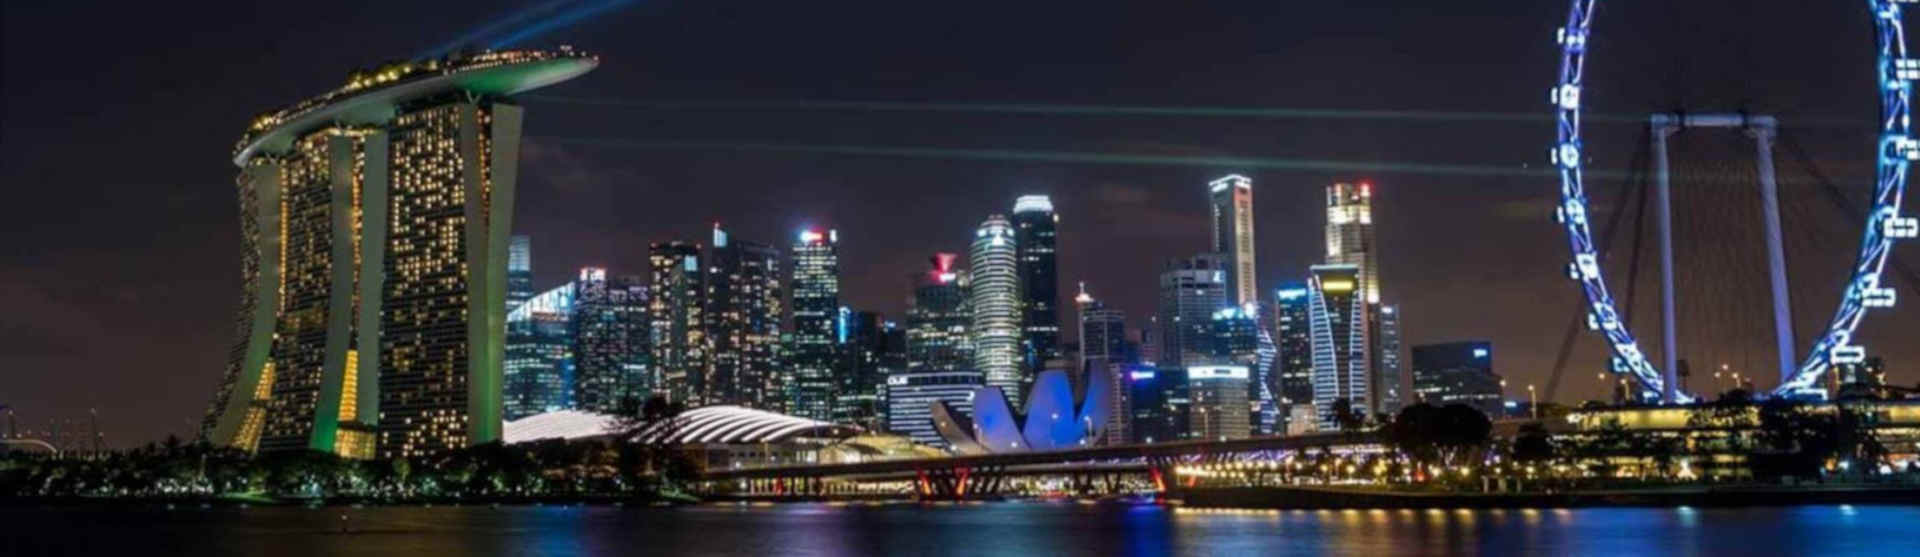 Accommodation near Marina Bay Singapore